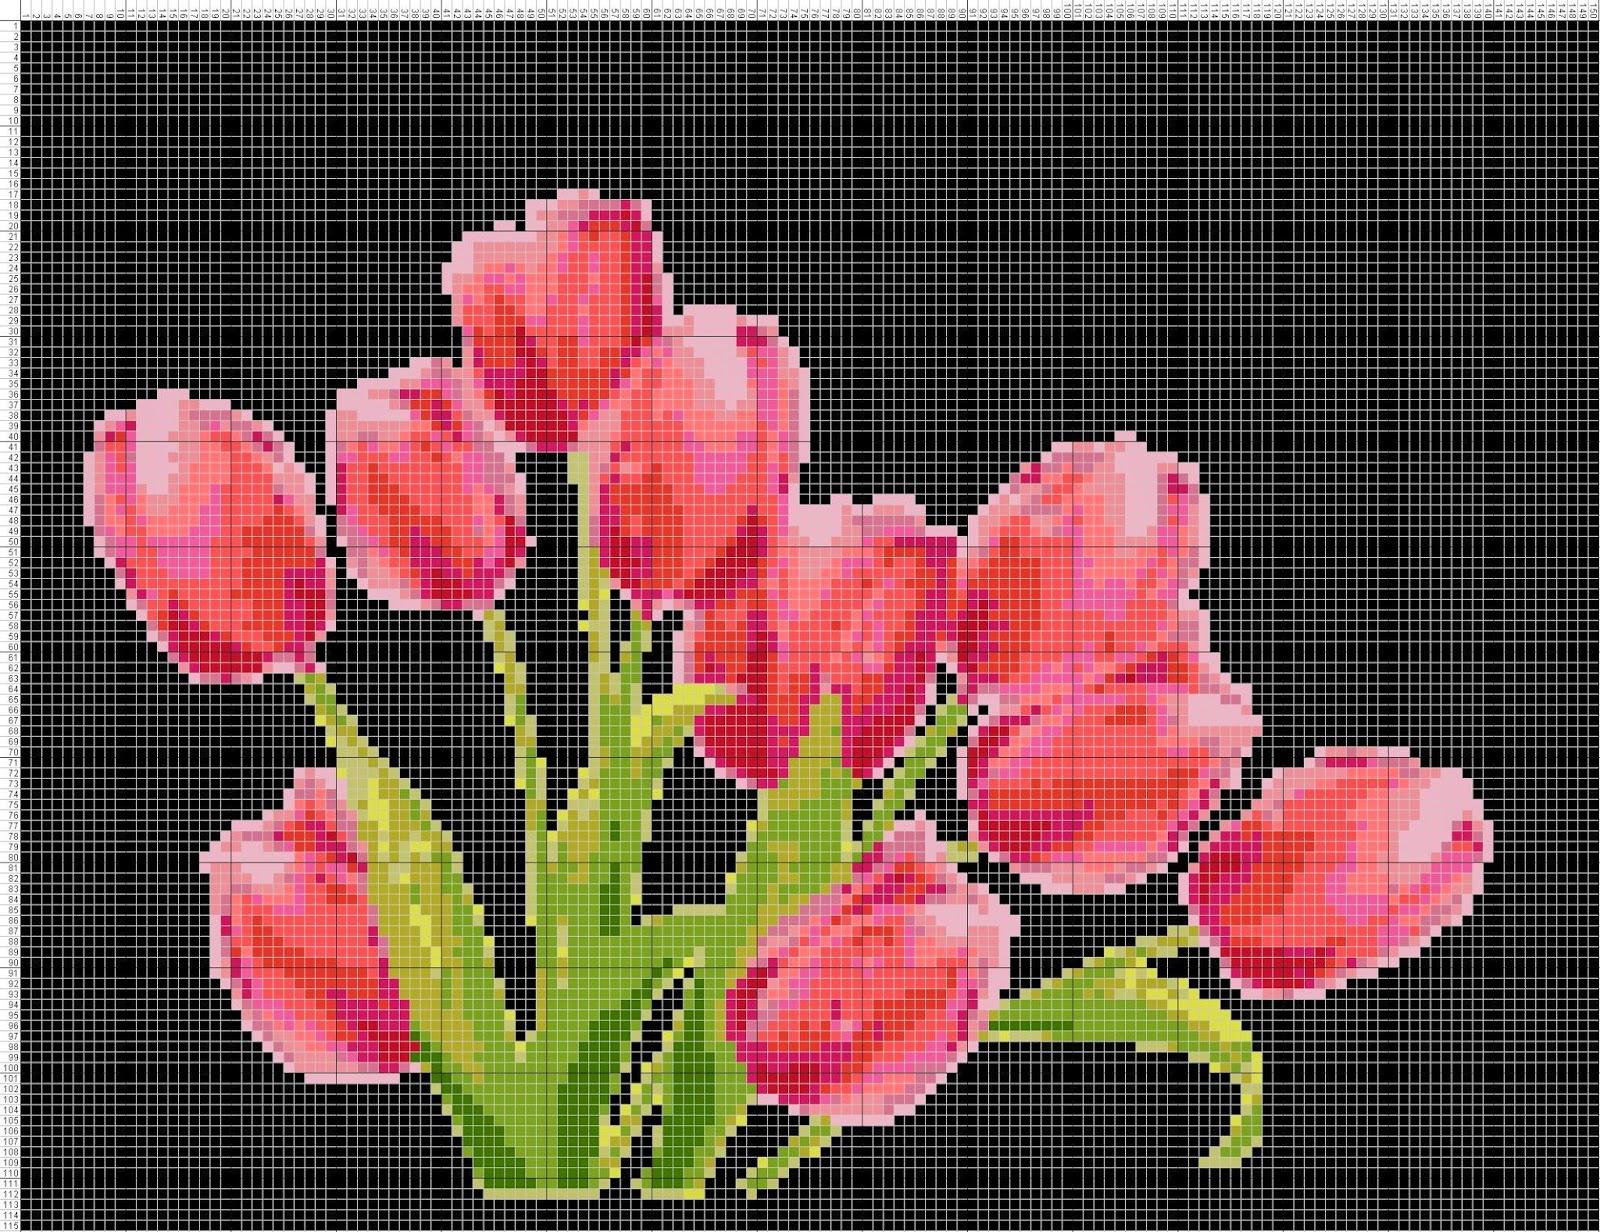 Gambar Pola Kristik Bunga Tulip Merah